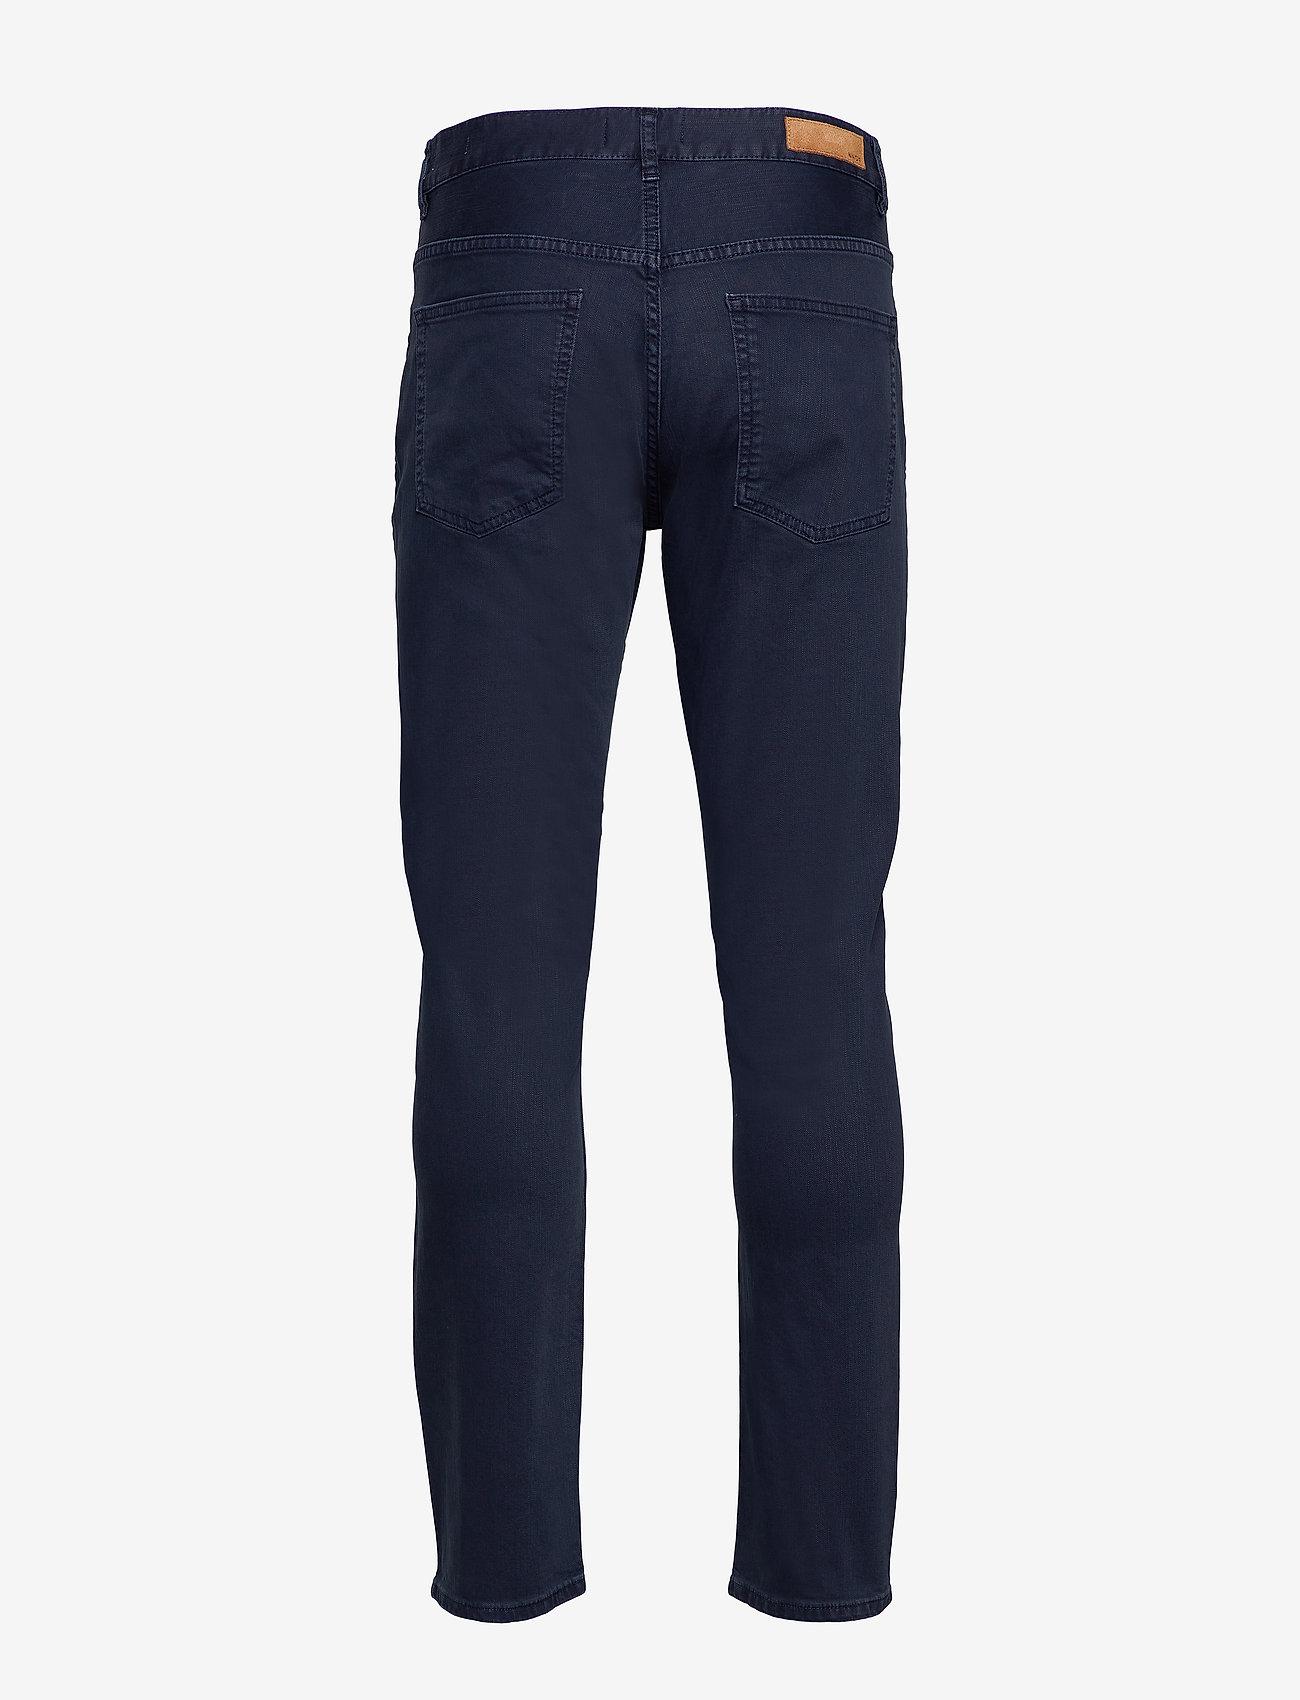 NN07 - Wilson 1819 L30 - slim jeans - navy blue - 1